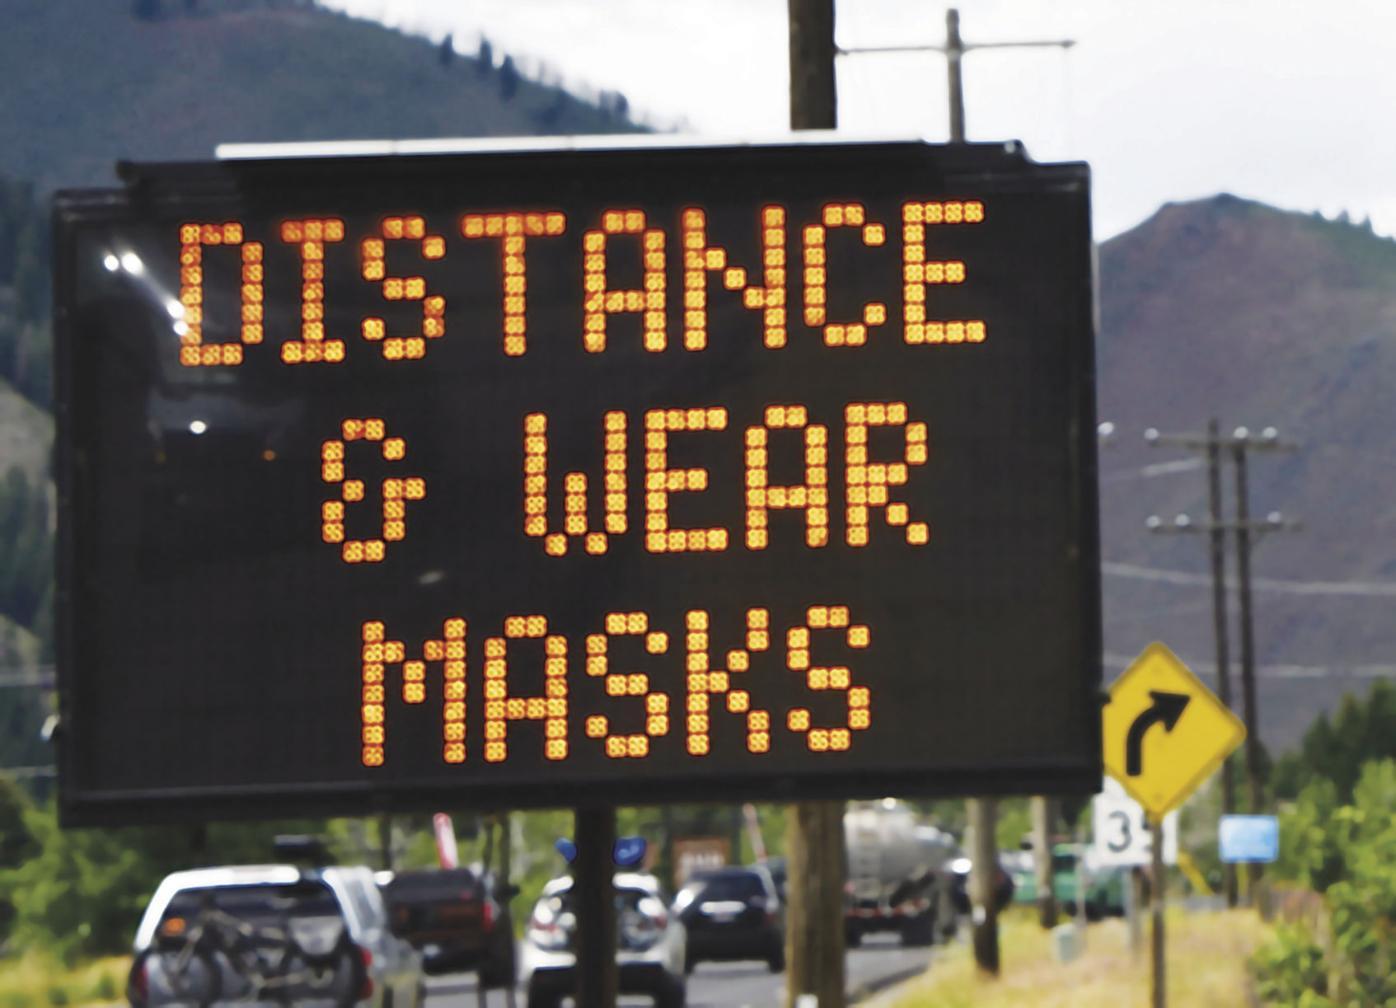 20-07-03 Social Distancing Mask sign 7 Roland WF.jpg